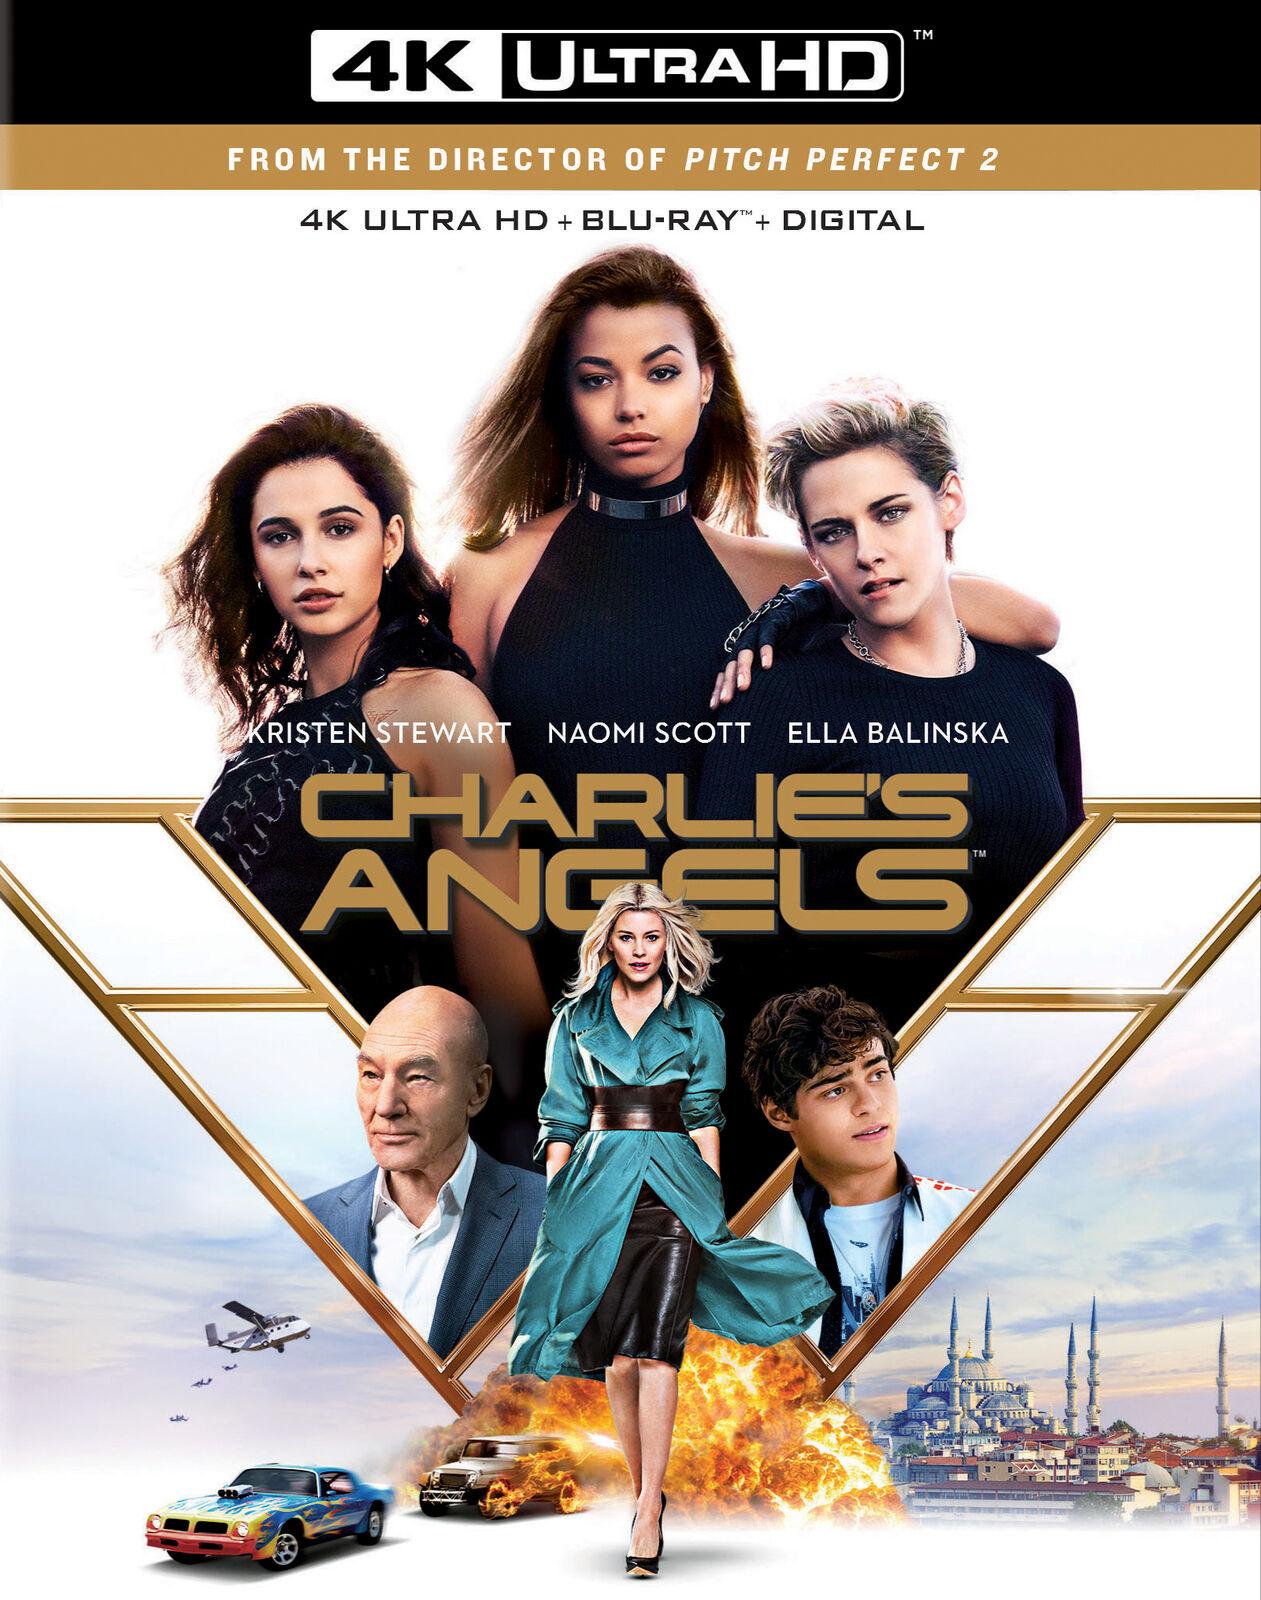 LIKE NEW Charlies Angels 4K NO Blu-Ray NO DIGITAL 2019 FREE SHIPPING - $9.99